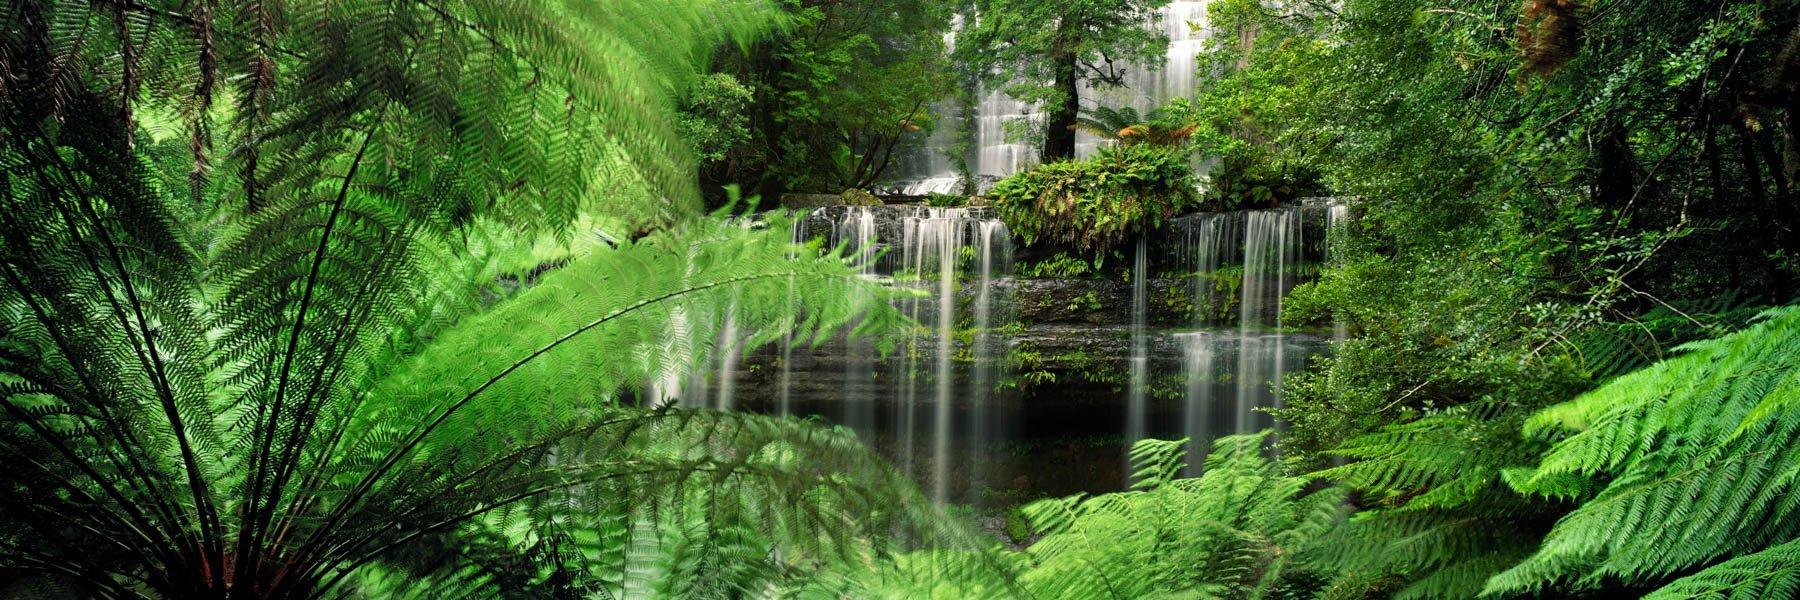 Tree ferns surrounding Russell Falls, Tasmania, Australia.